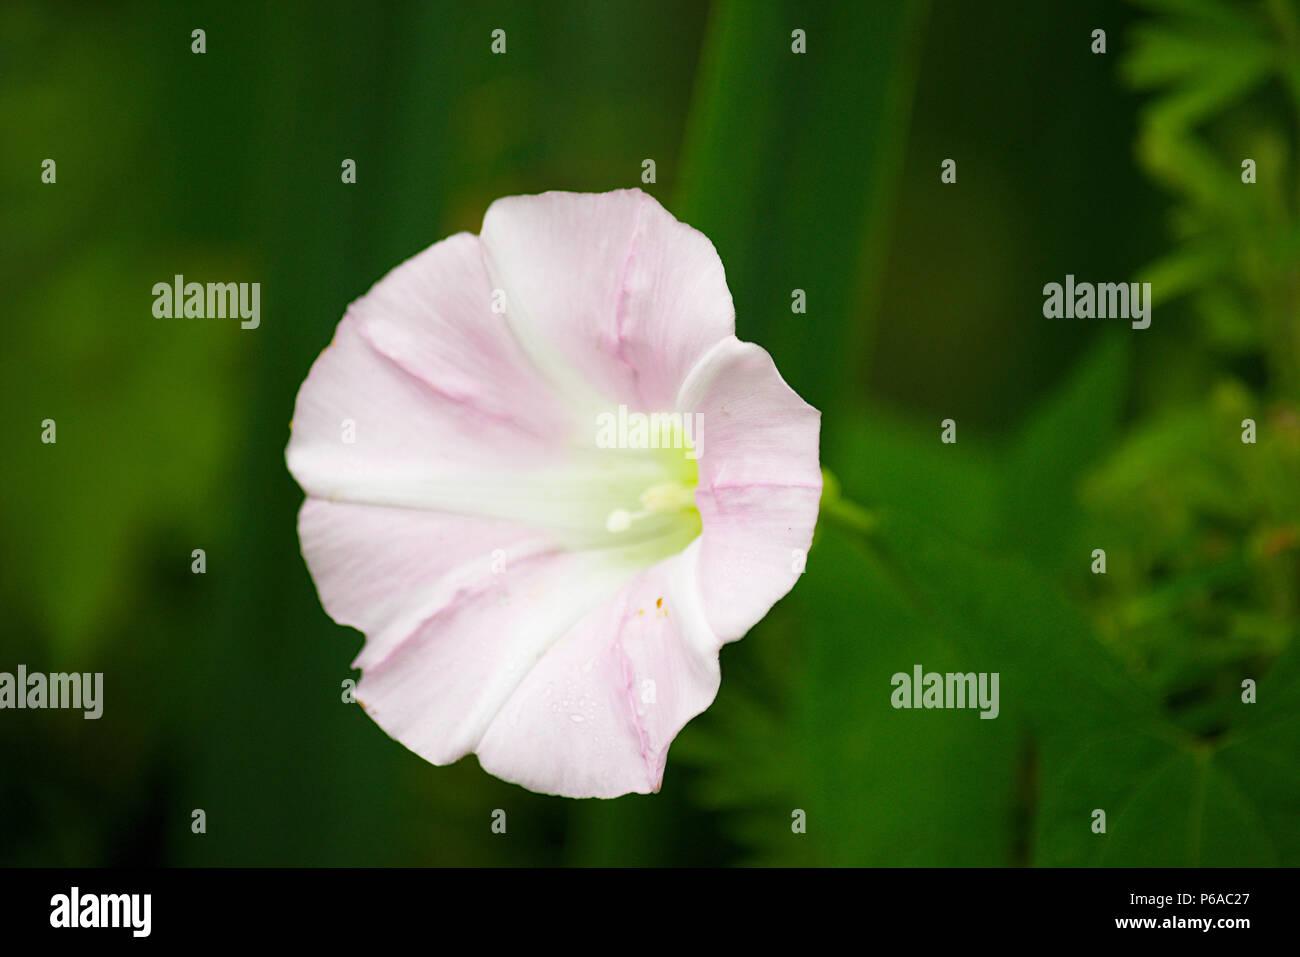 Light pink flower blossom - Stock Image